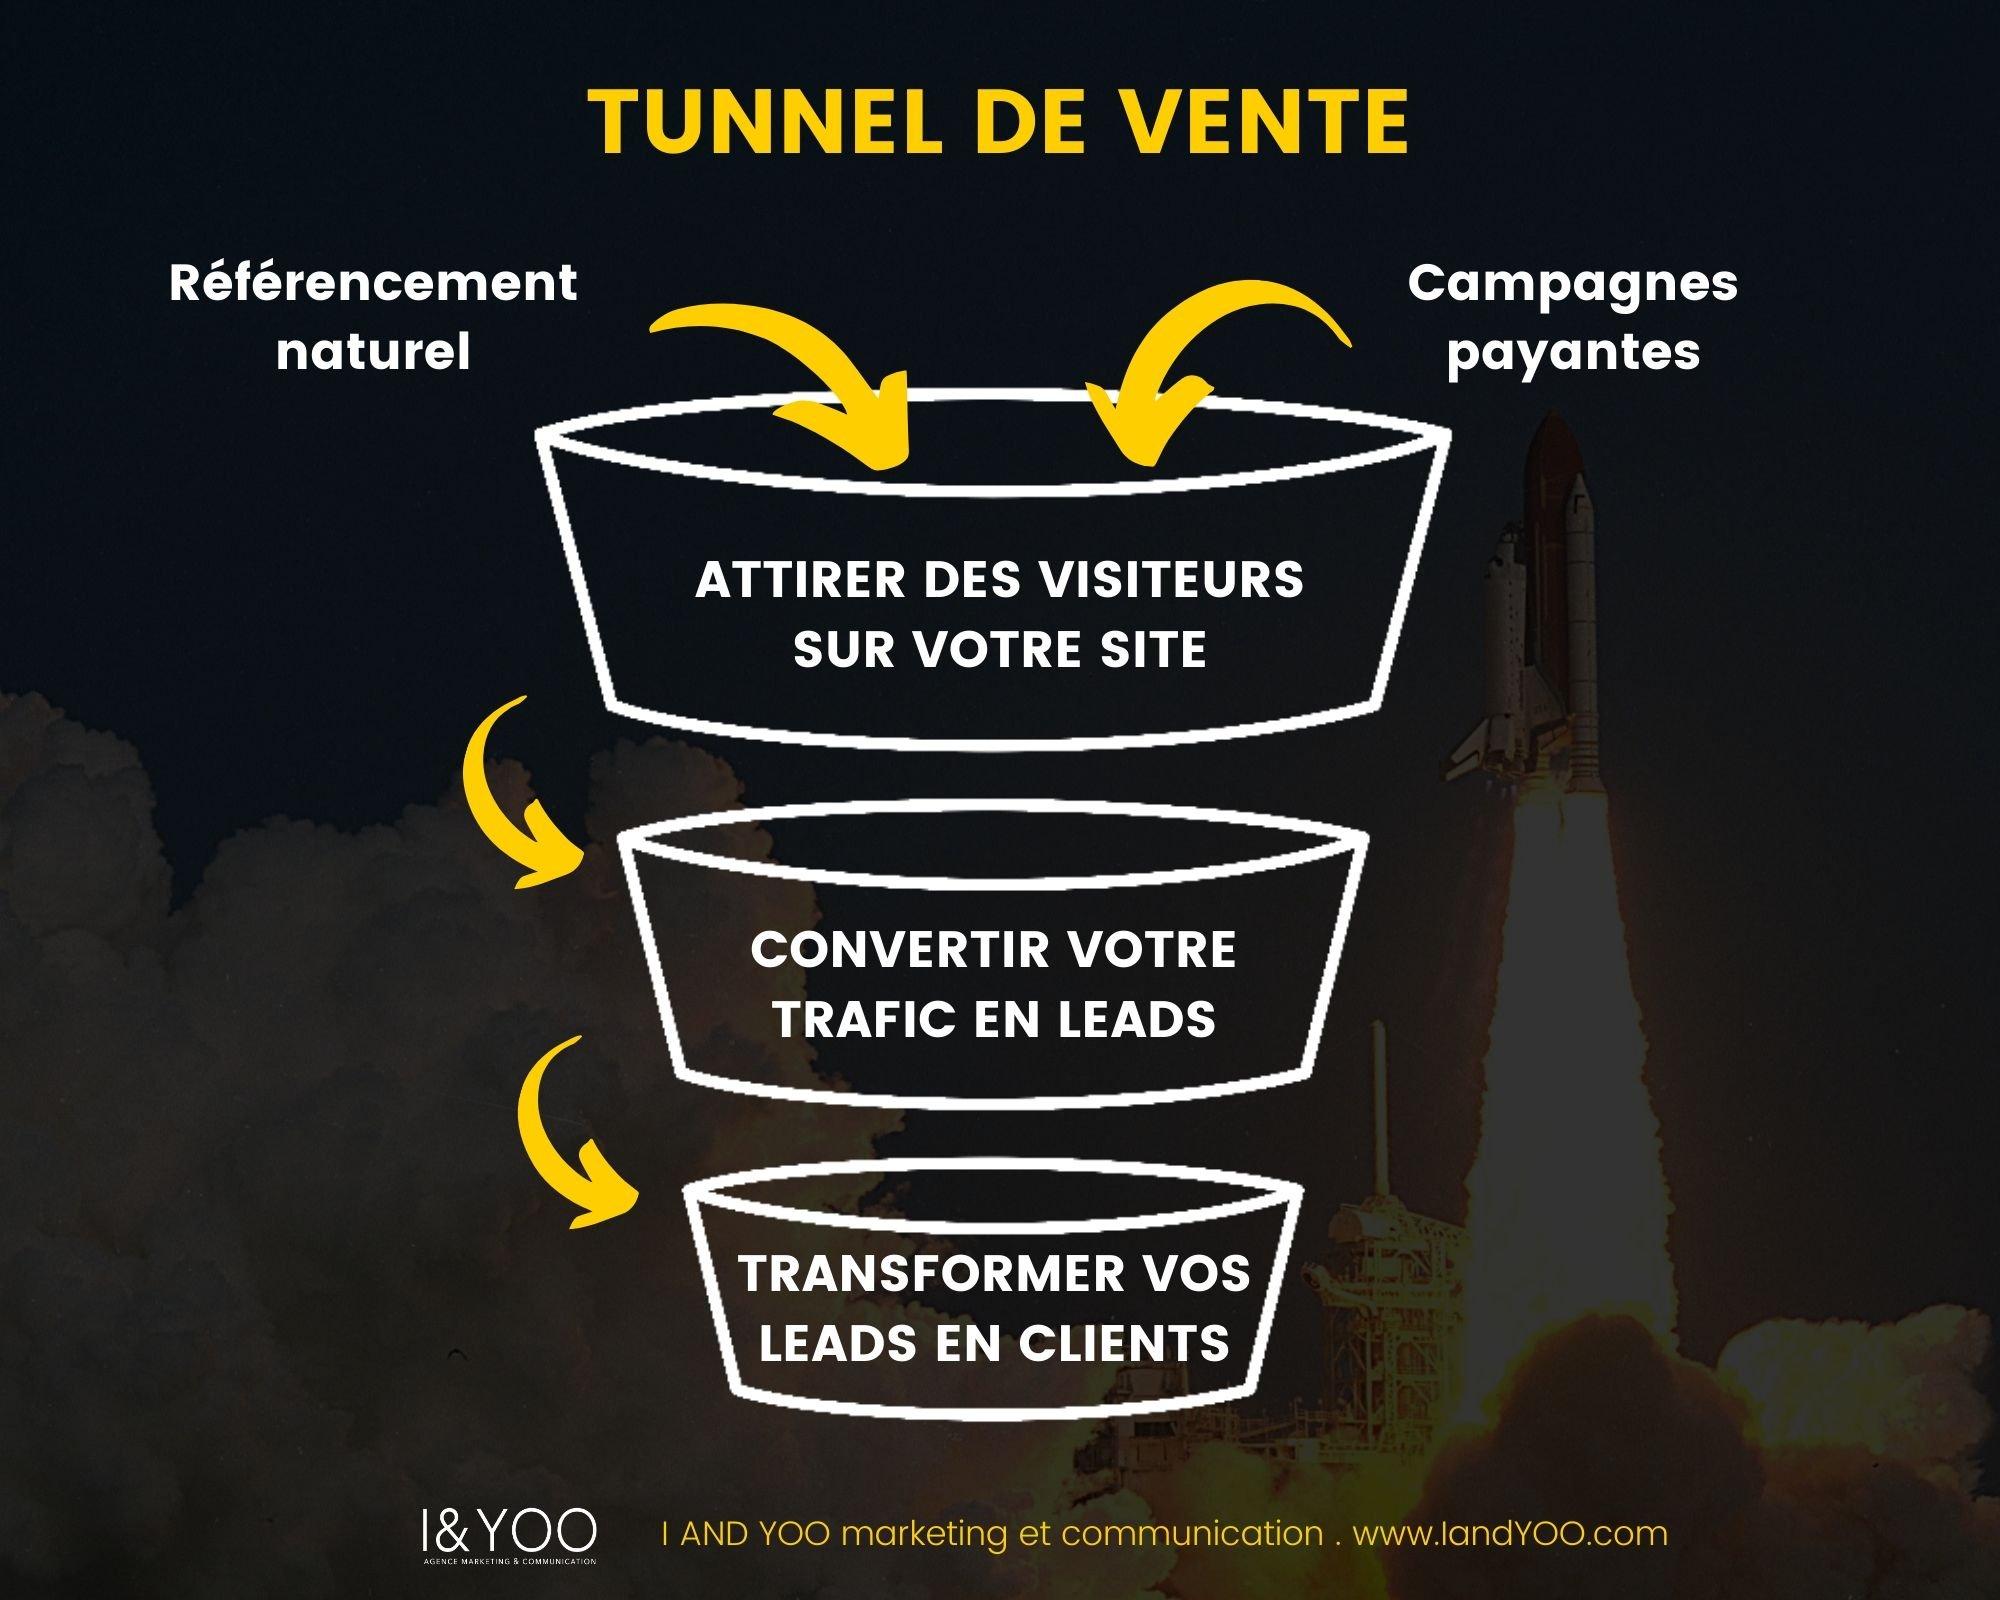 lead generation tunnel de vente